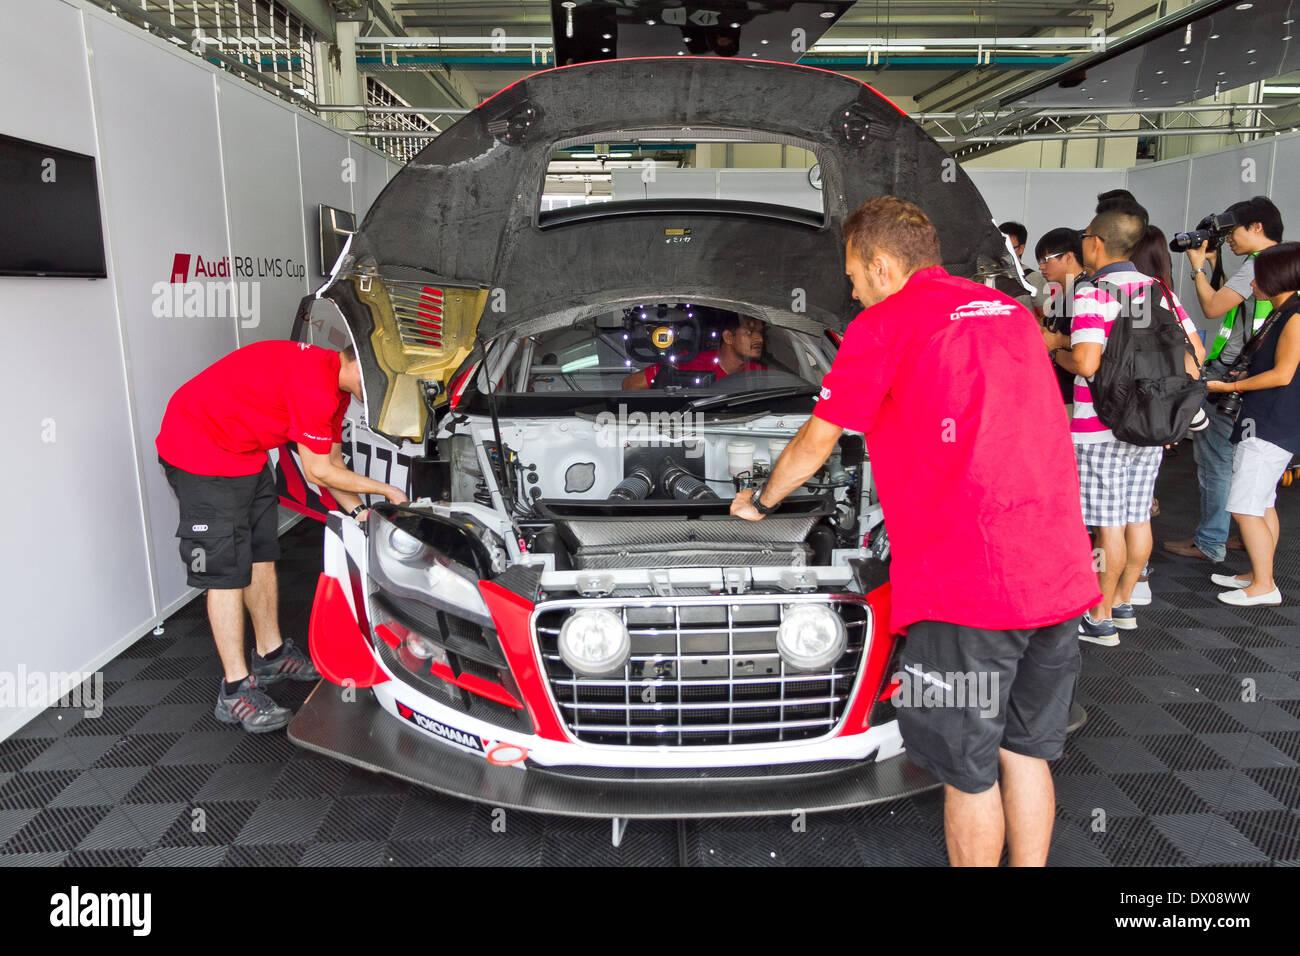 Audi LMS Cup 2013 Pit Work Shop Stock Photo